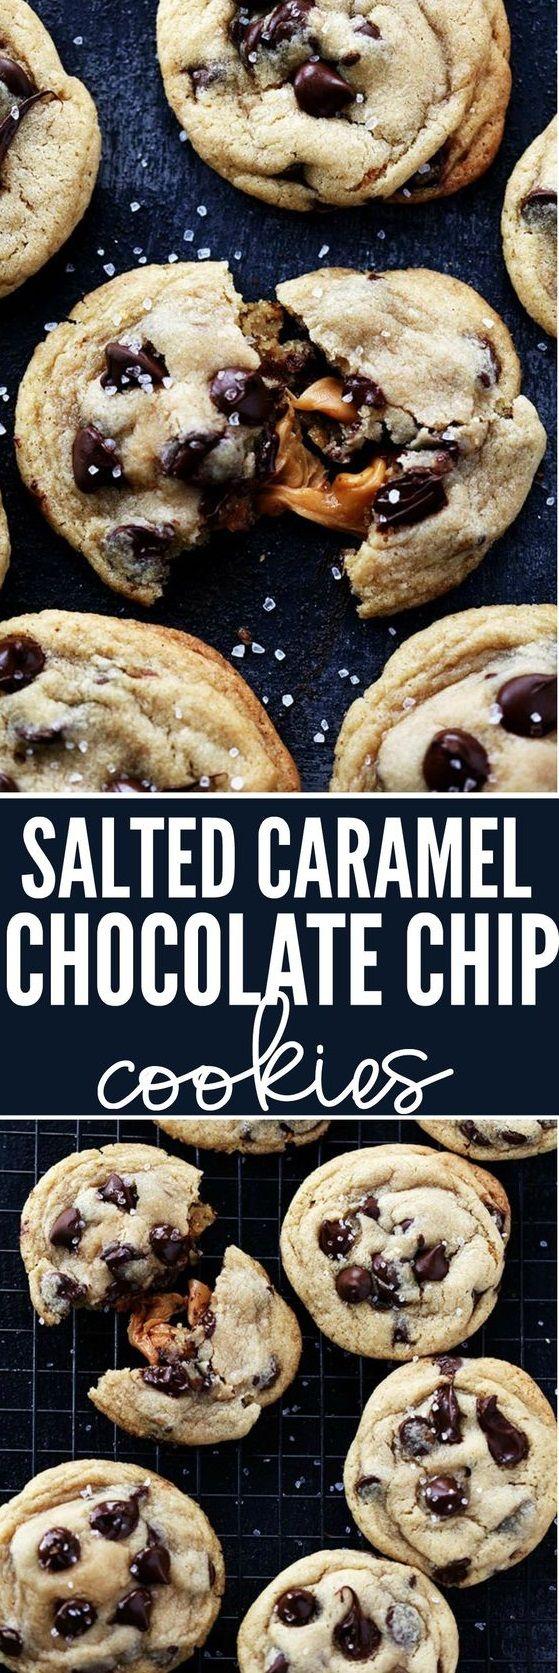 Salted Caramel Stuffed Chocolate Chip Cookies | Pechenuhi